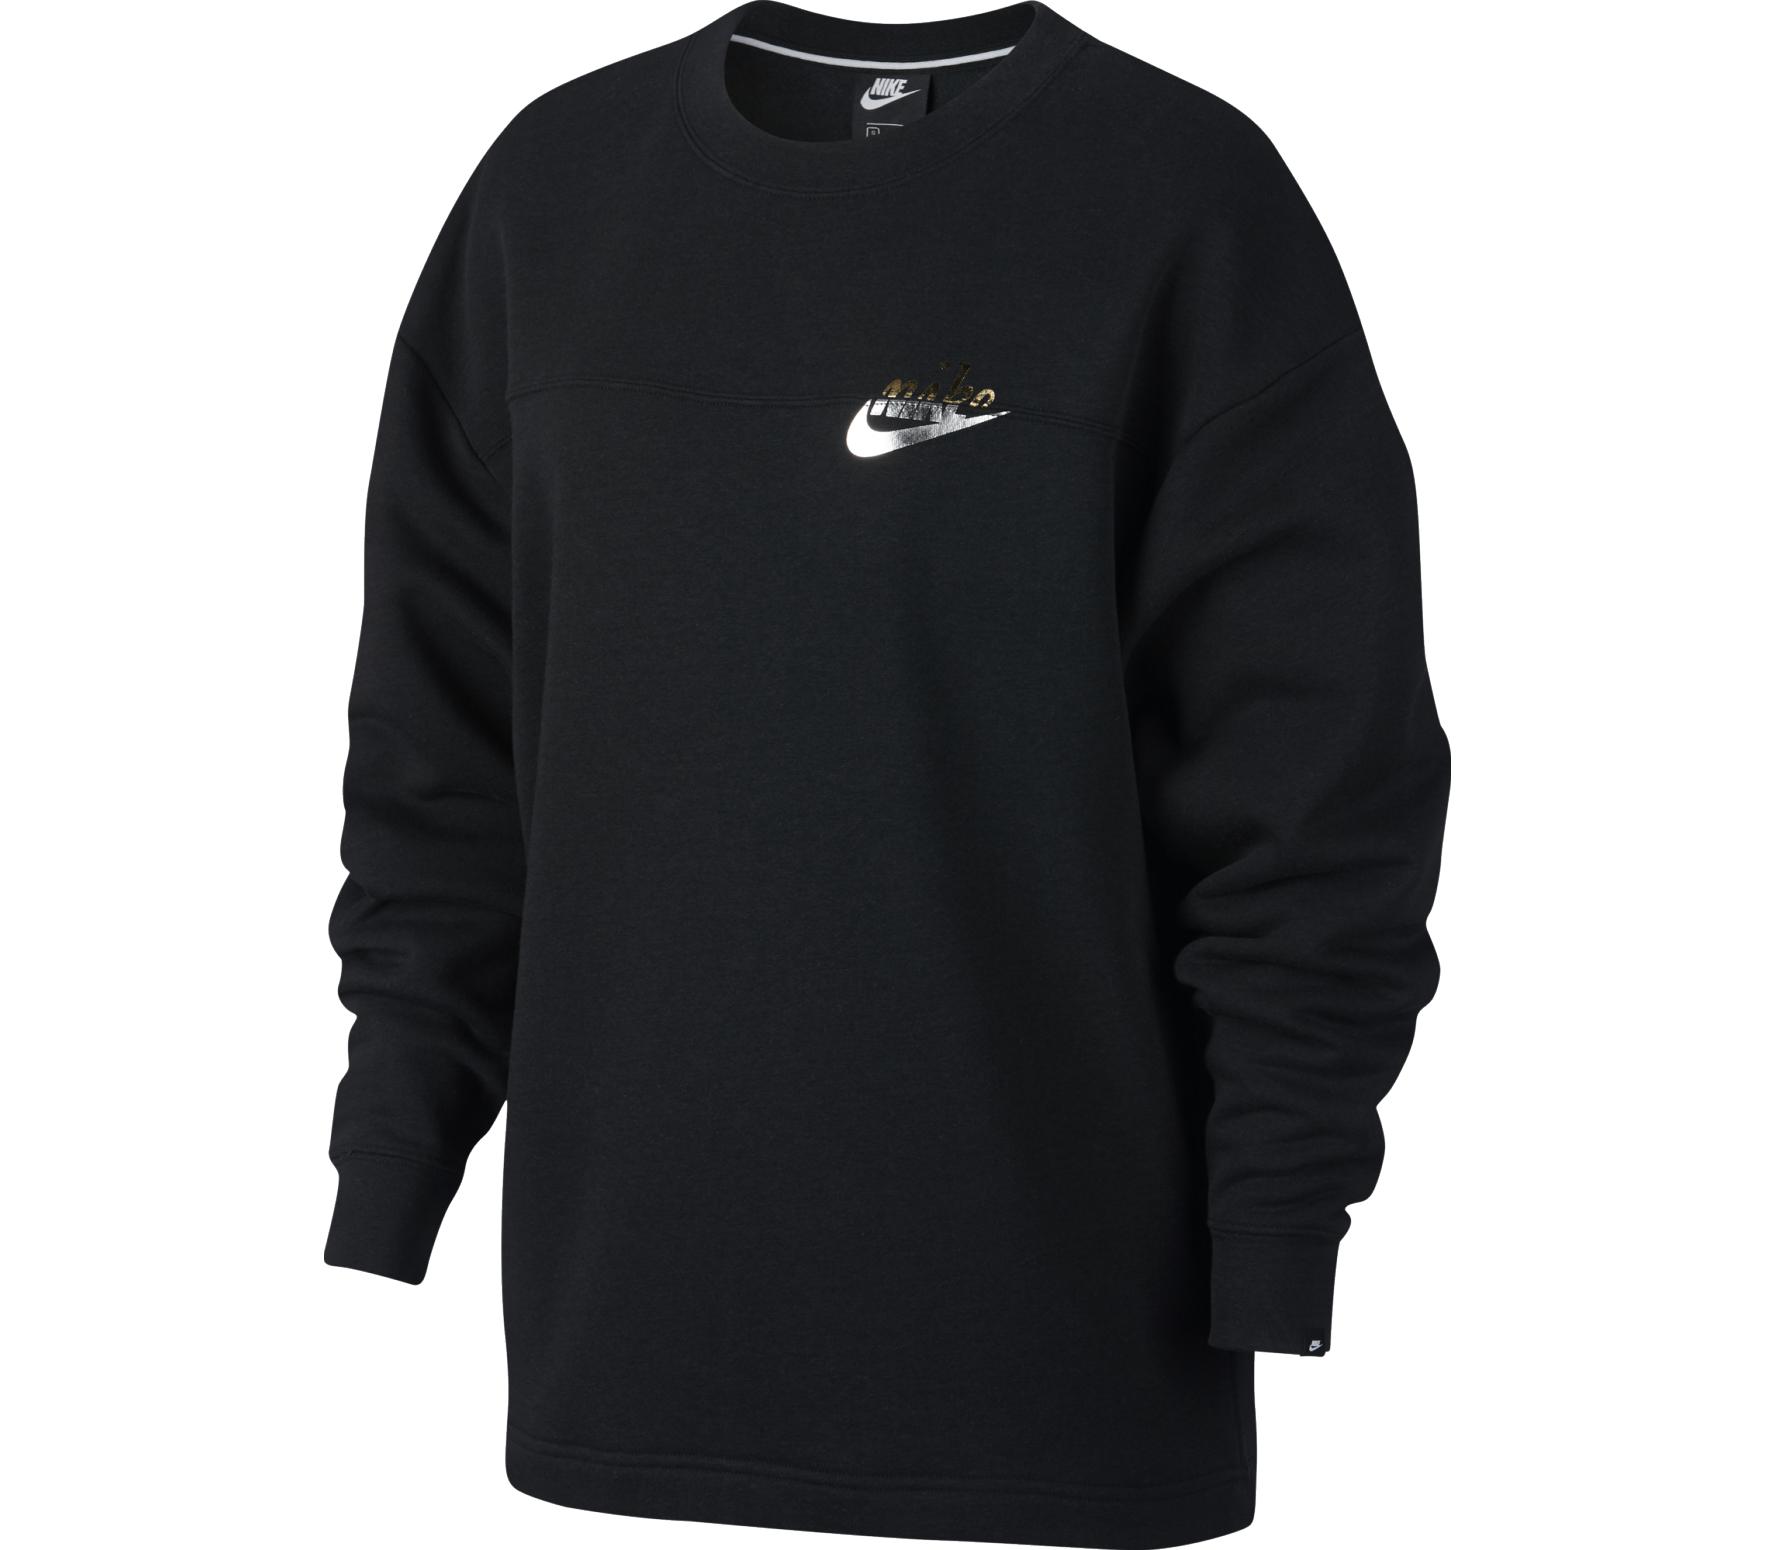 Nike Sportswear Rally Metallic Dam Sweatshirt svart